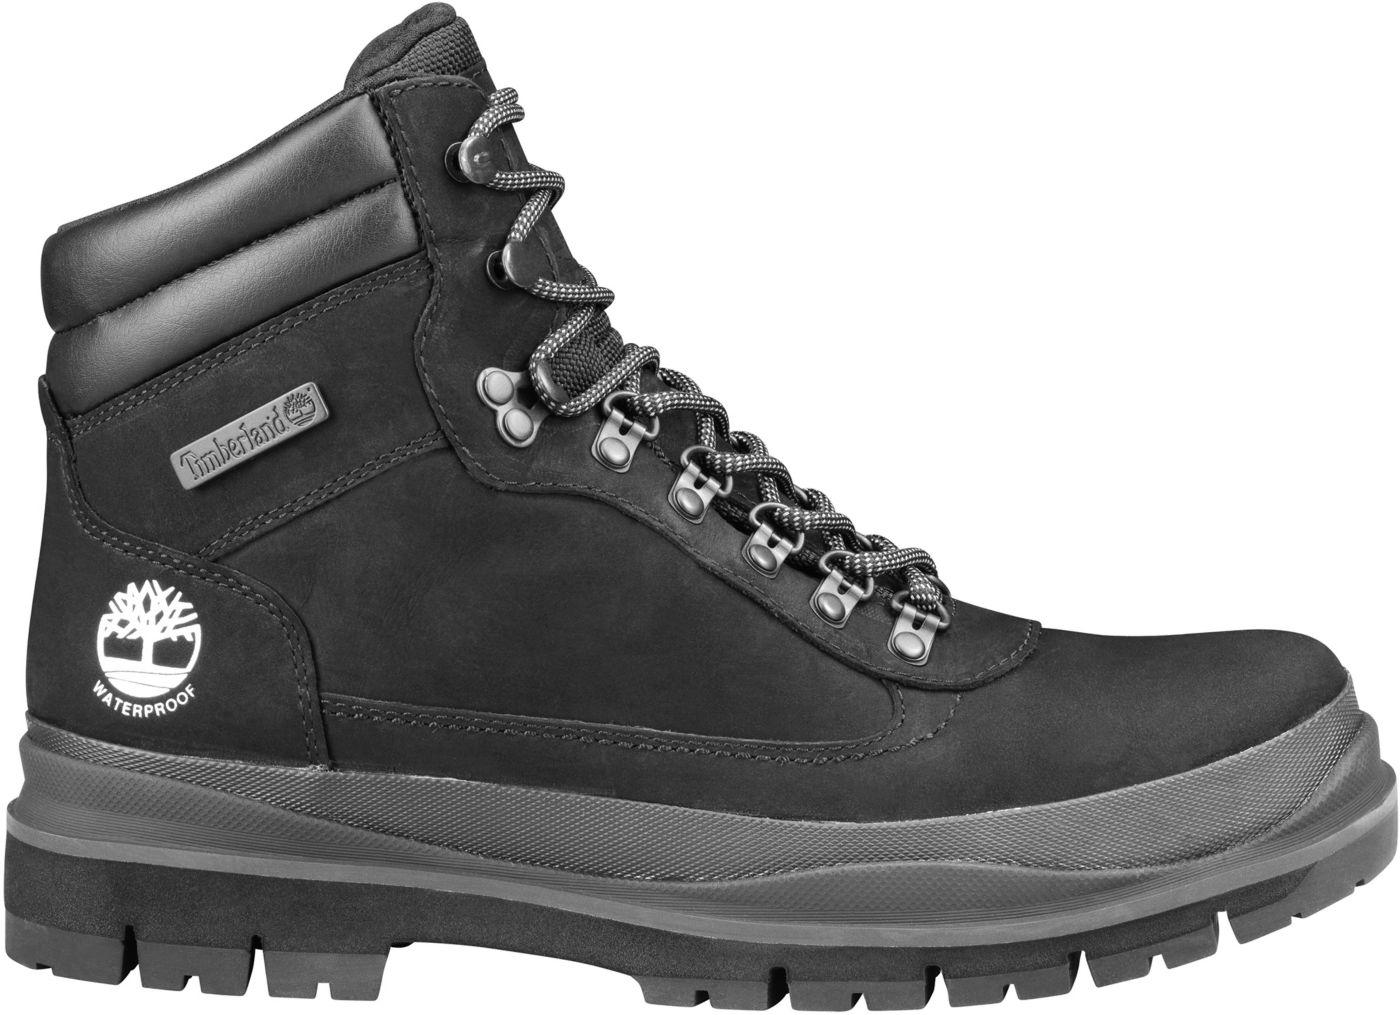 Timberland Men's Field Trekker 200g Waterproof Hiking Boots